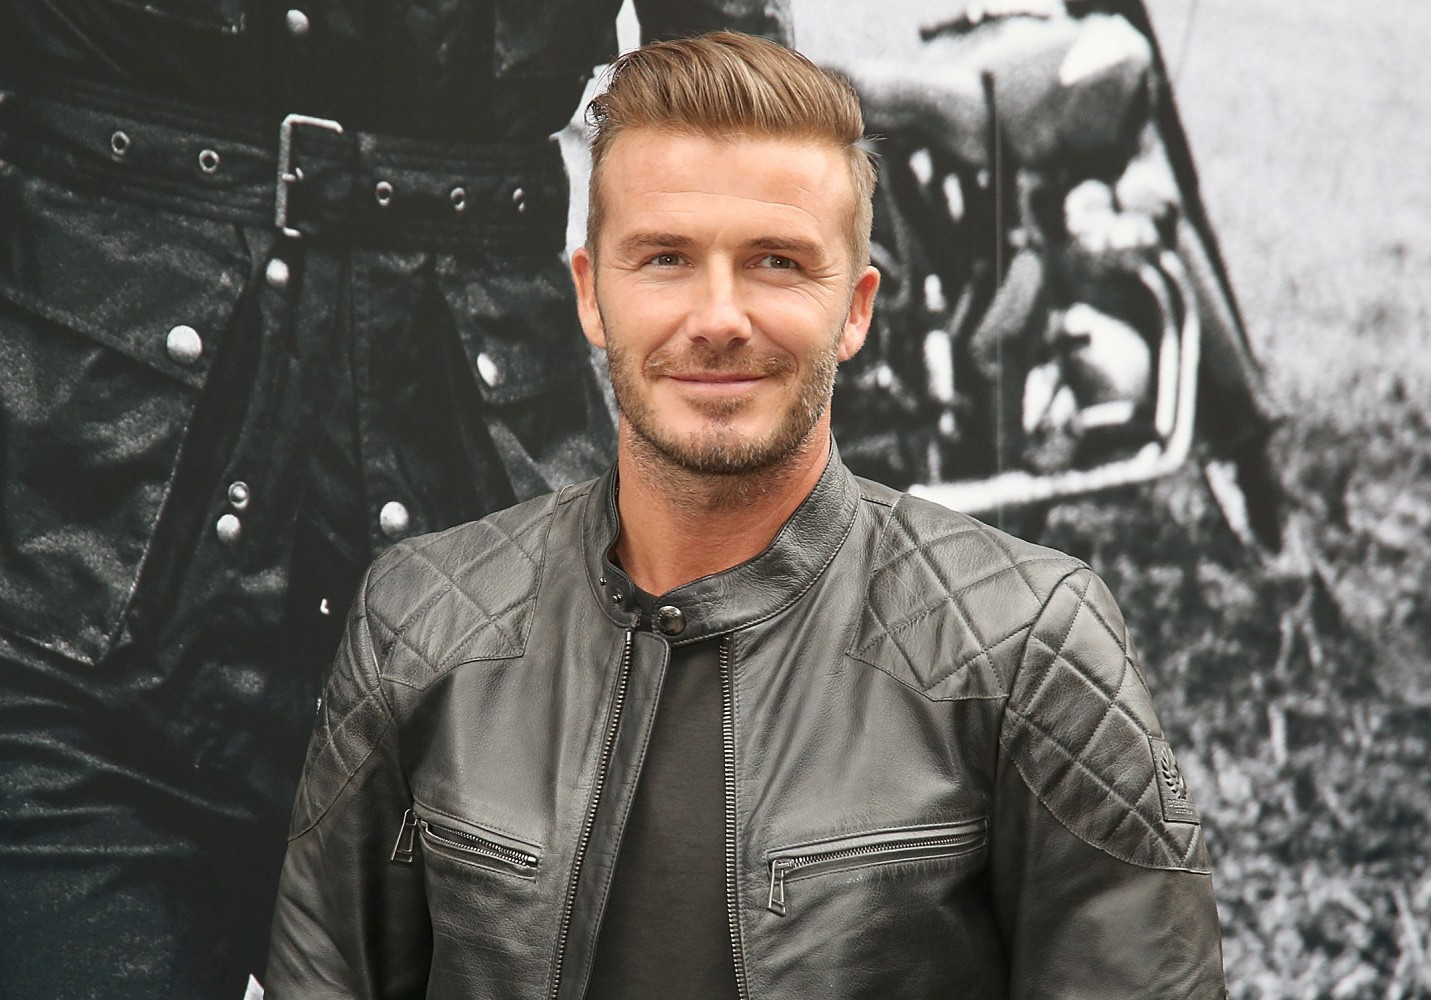 David Beckham Hairstyle 9454